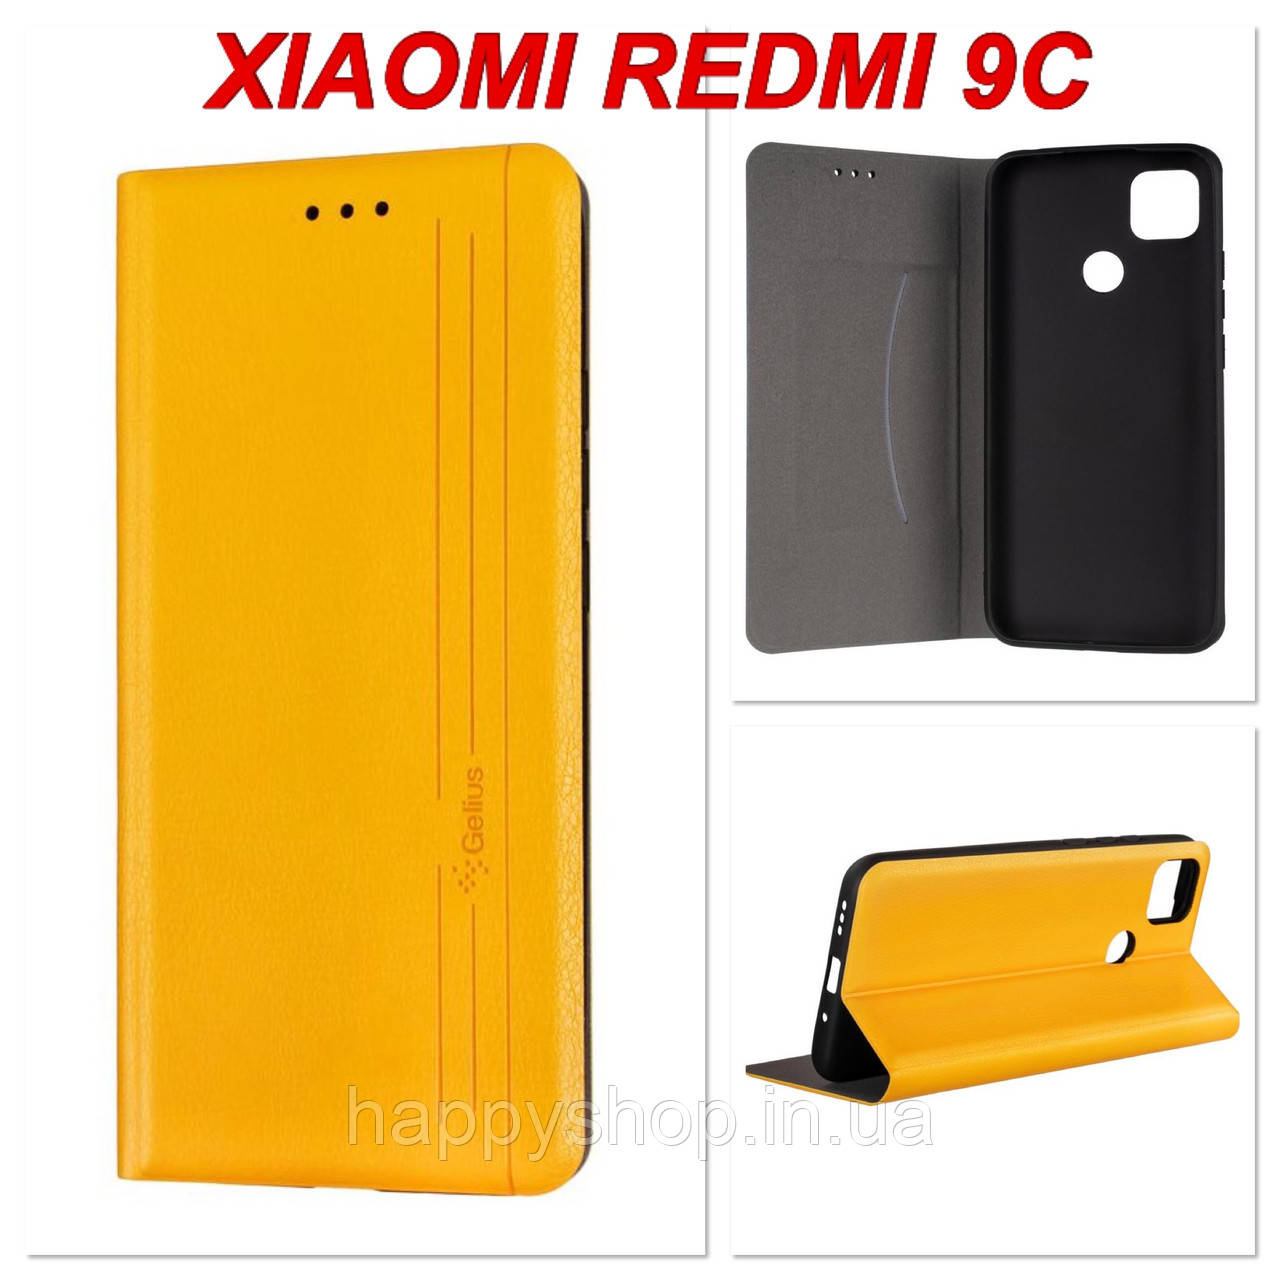 Чехол-книжка Gelius Leather New для Xiaomi Redmi 9C (Желтый)